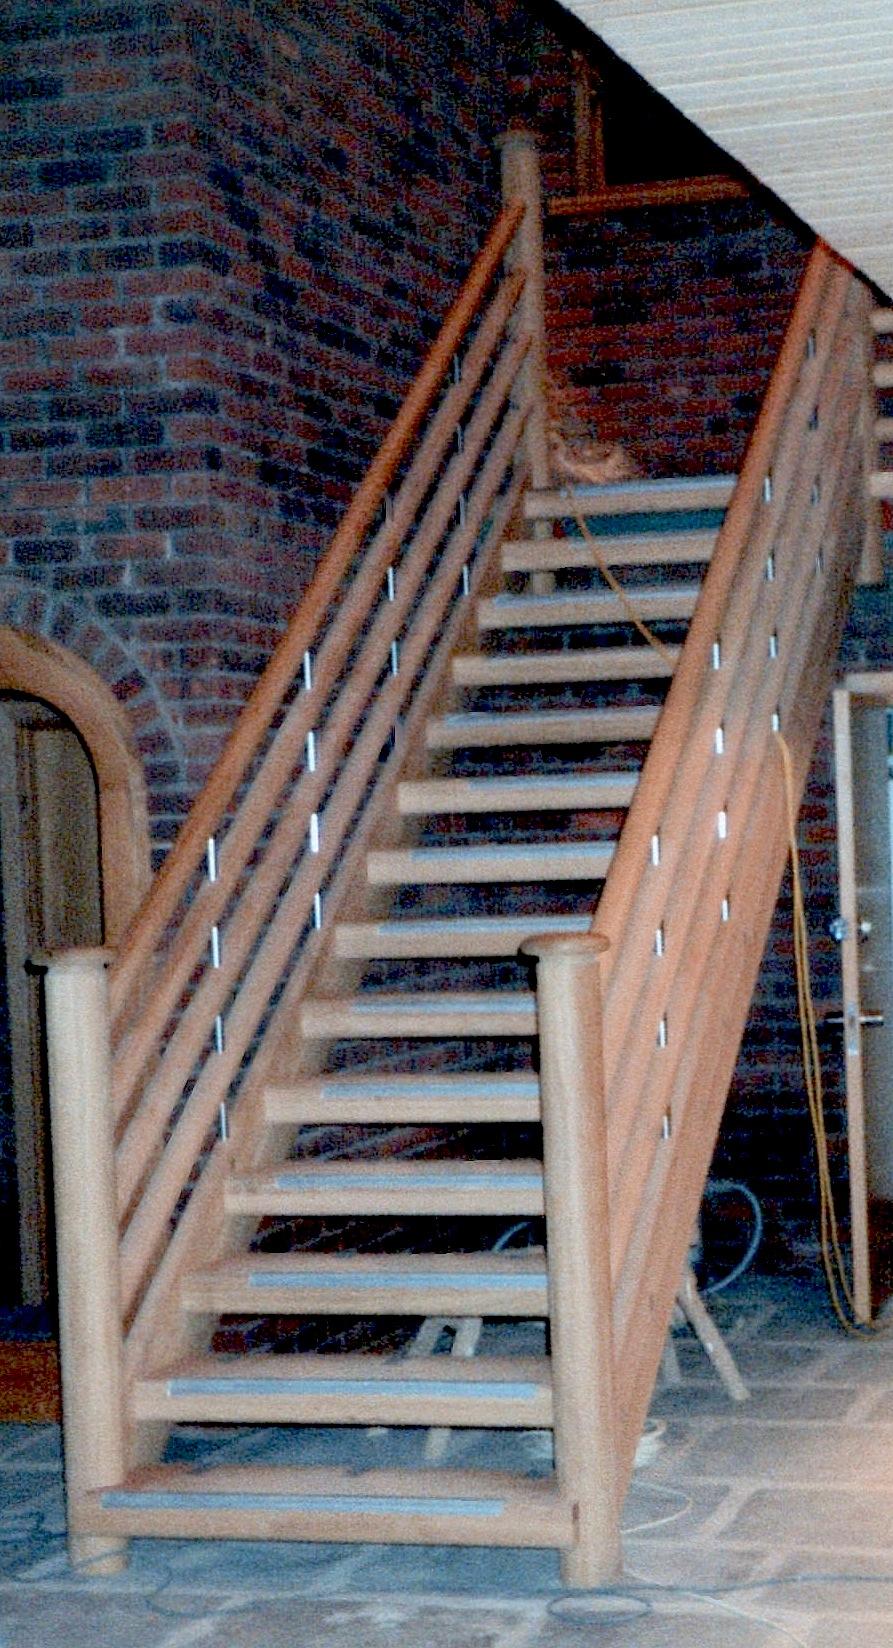 Nautical-Staircase